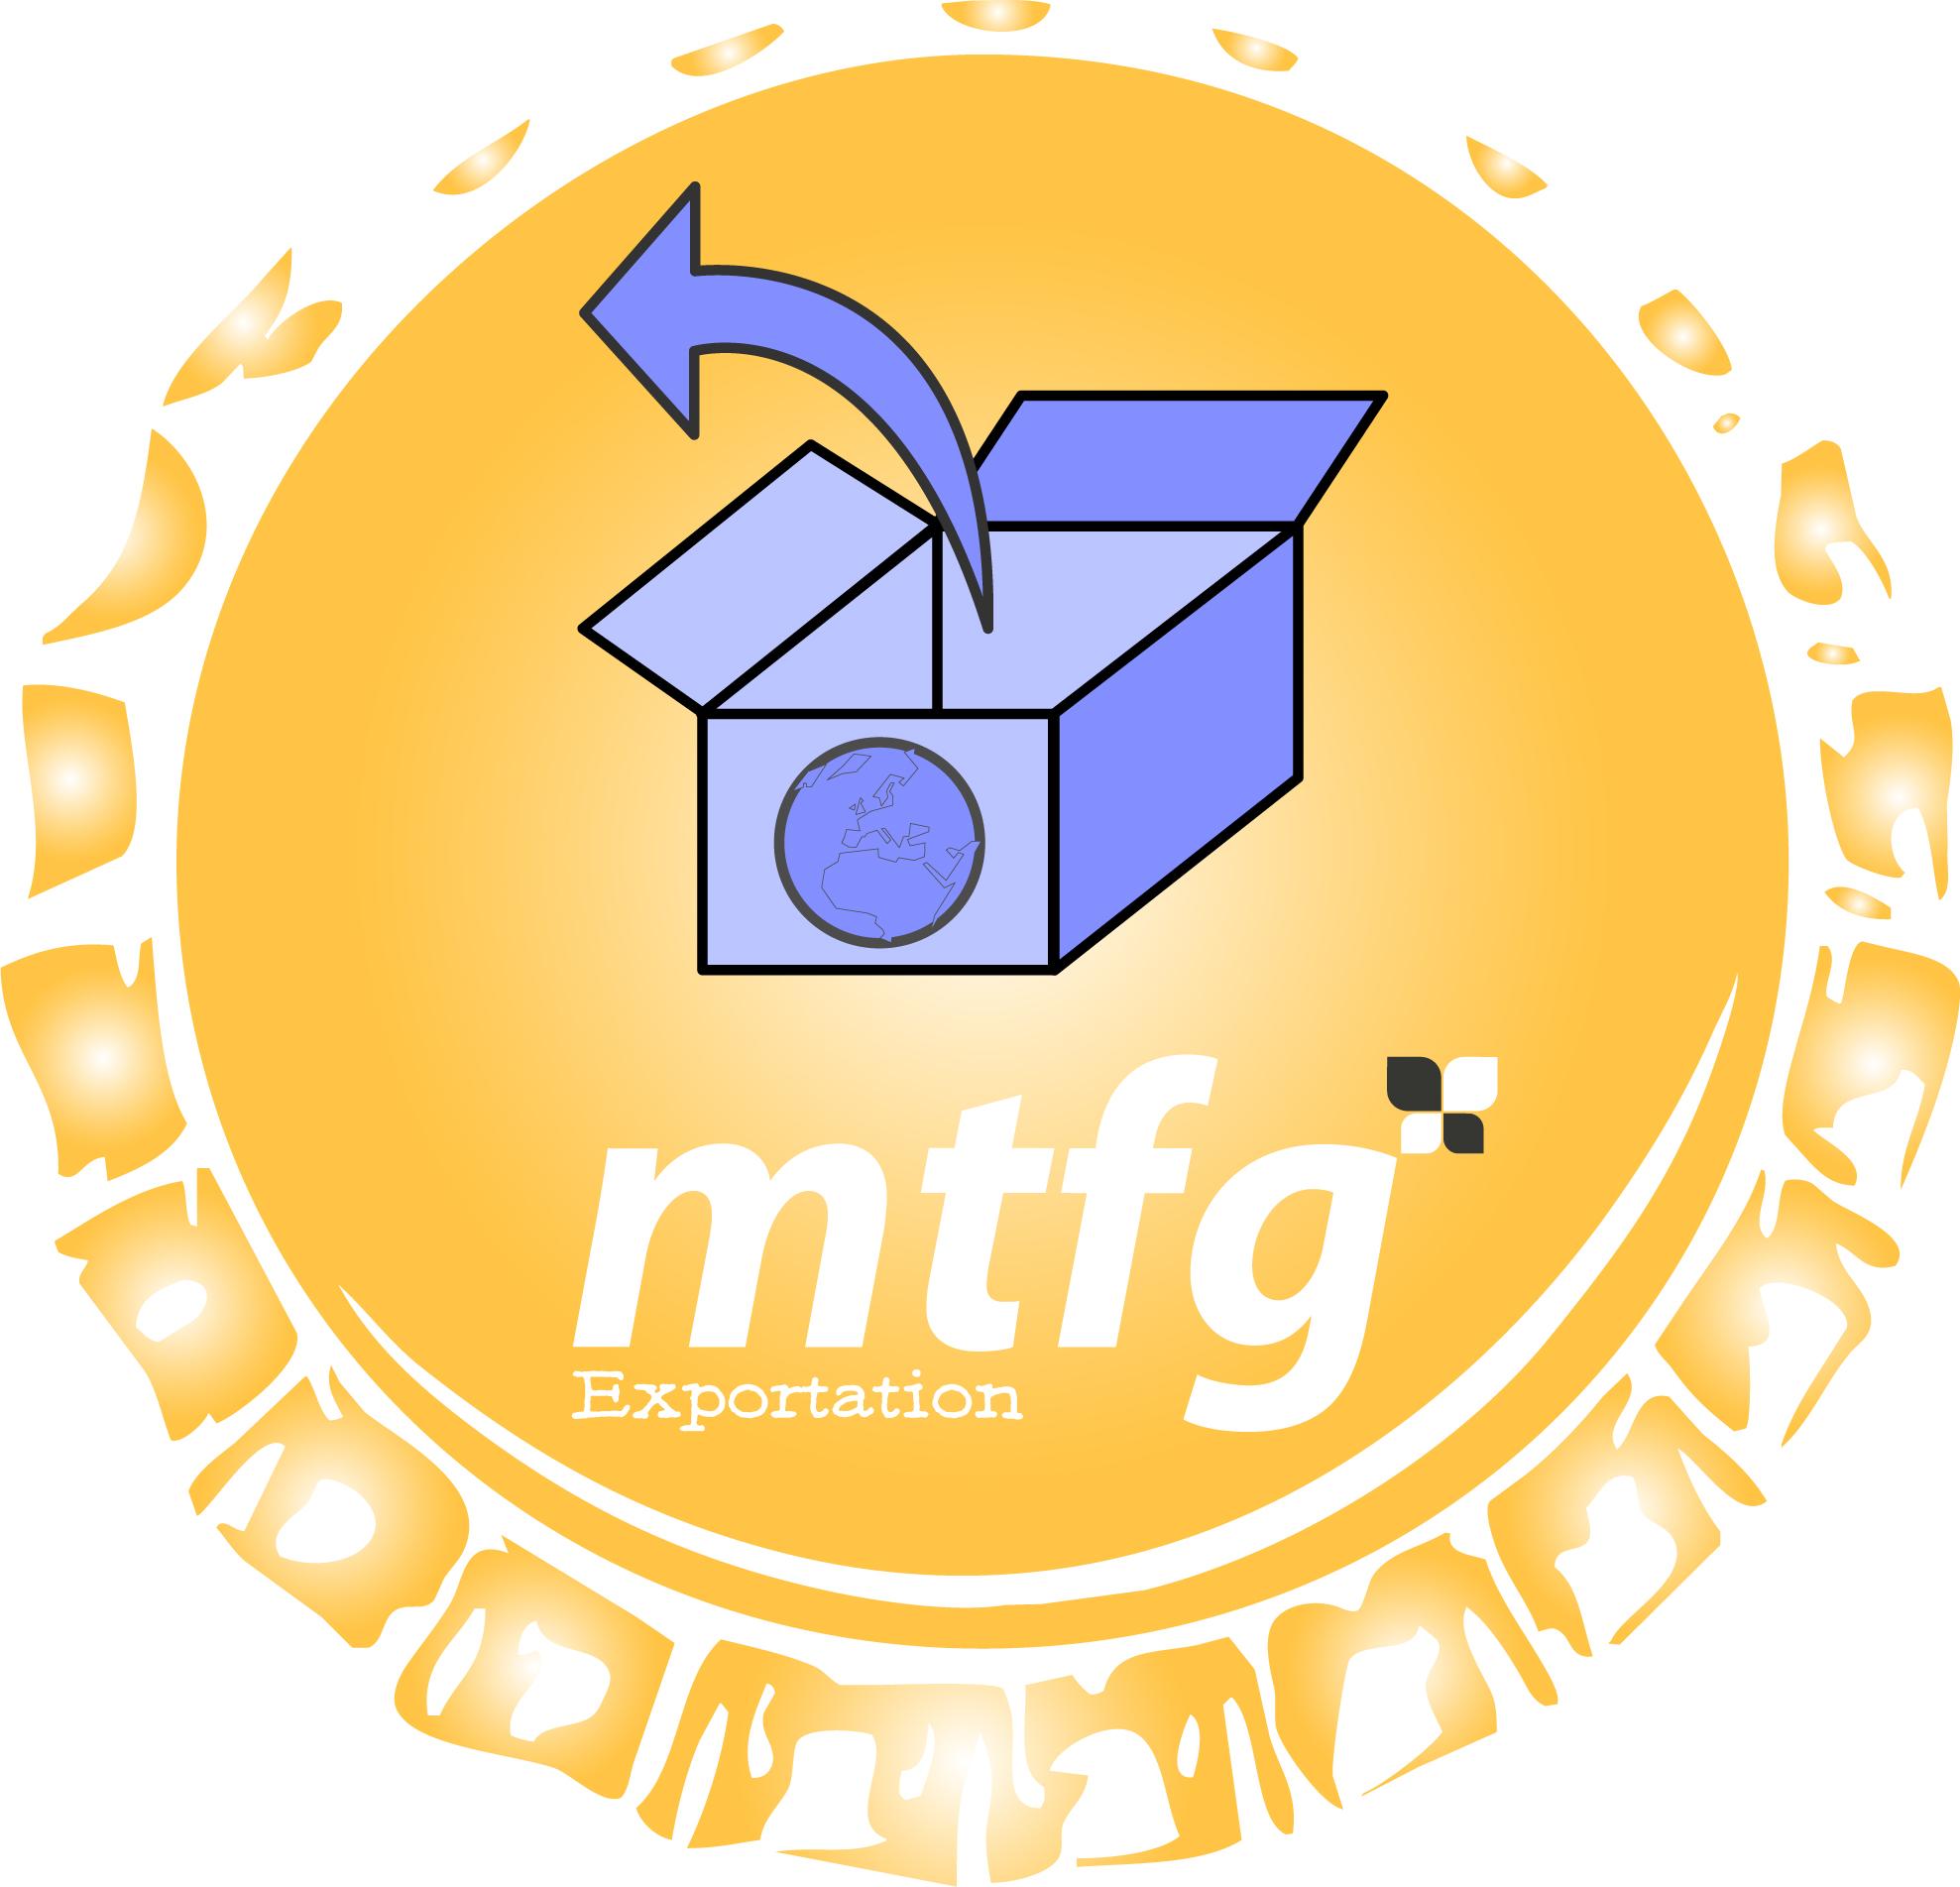 MTFG Exportation